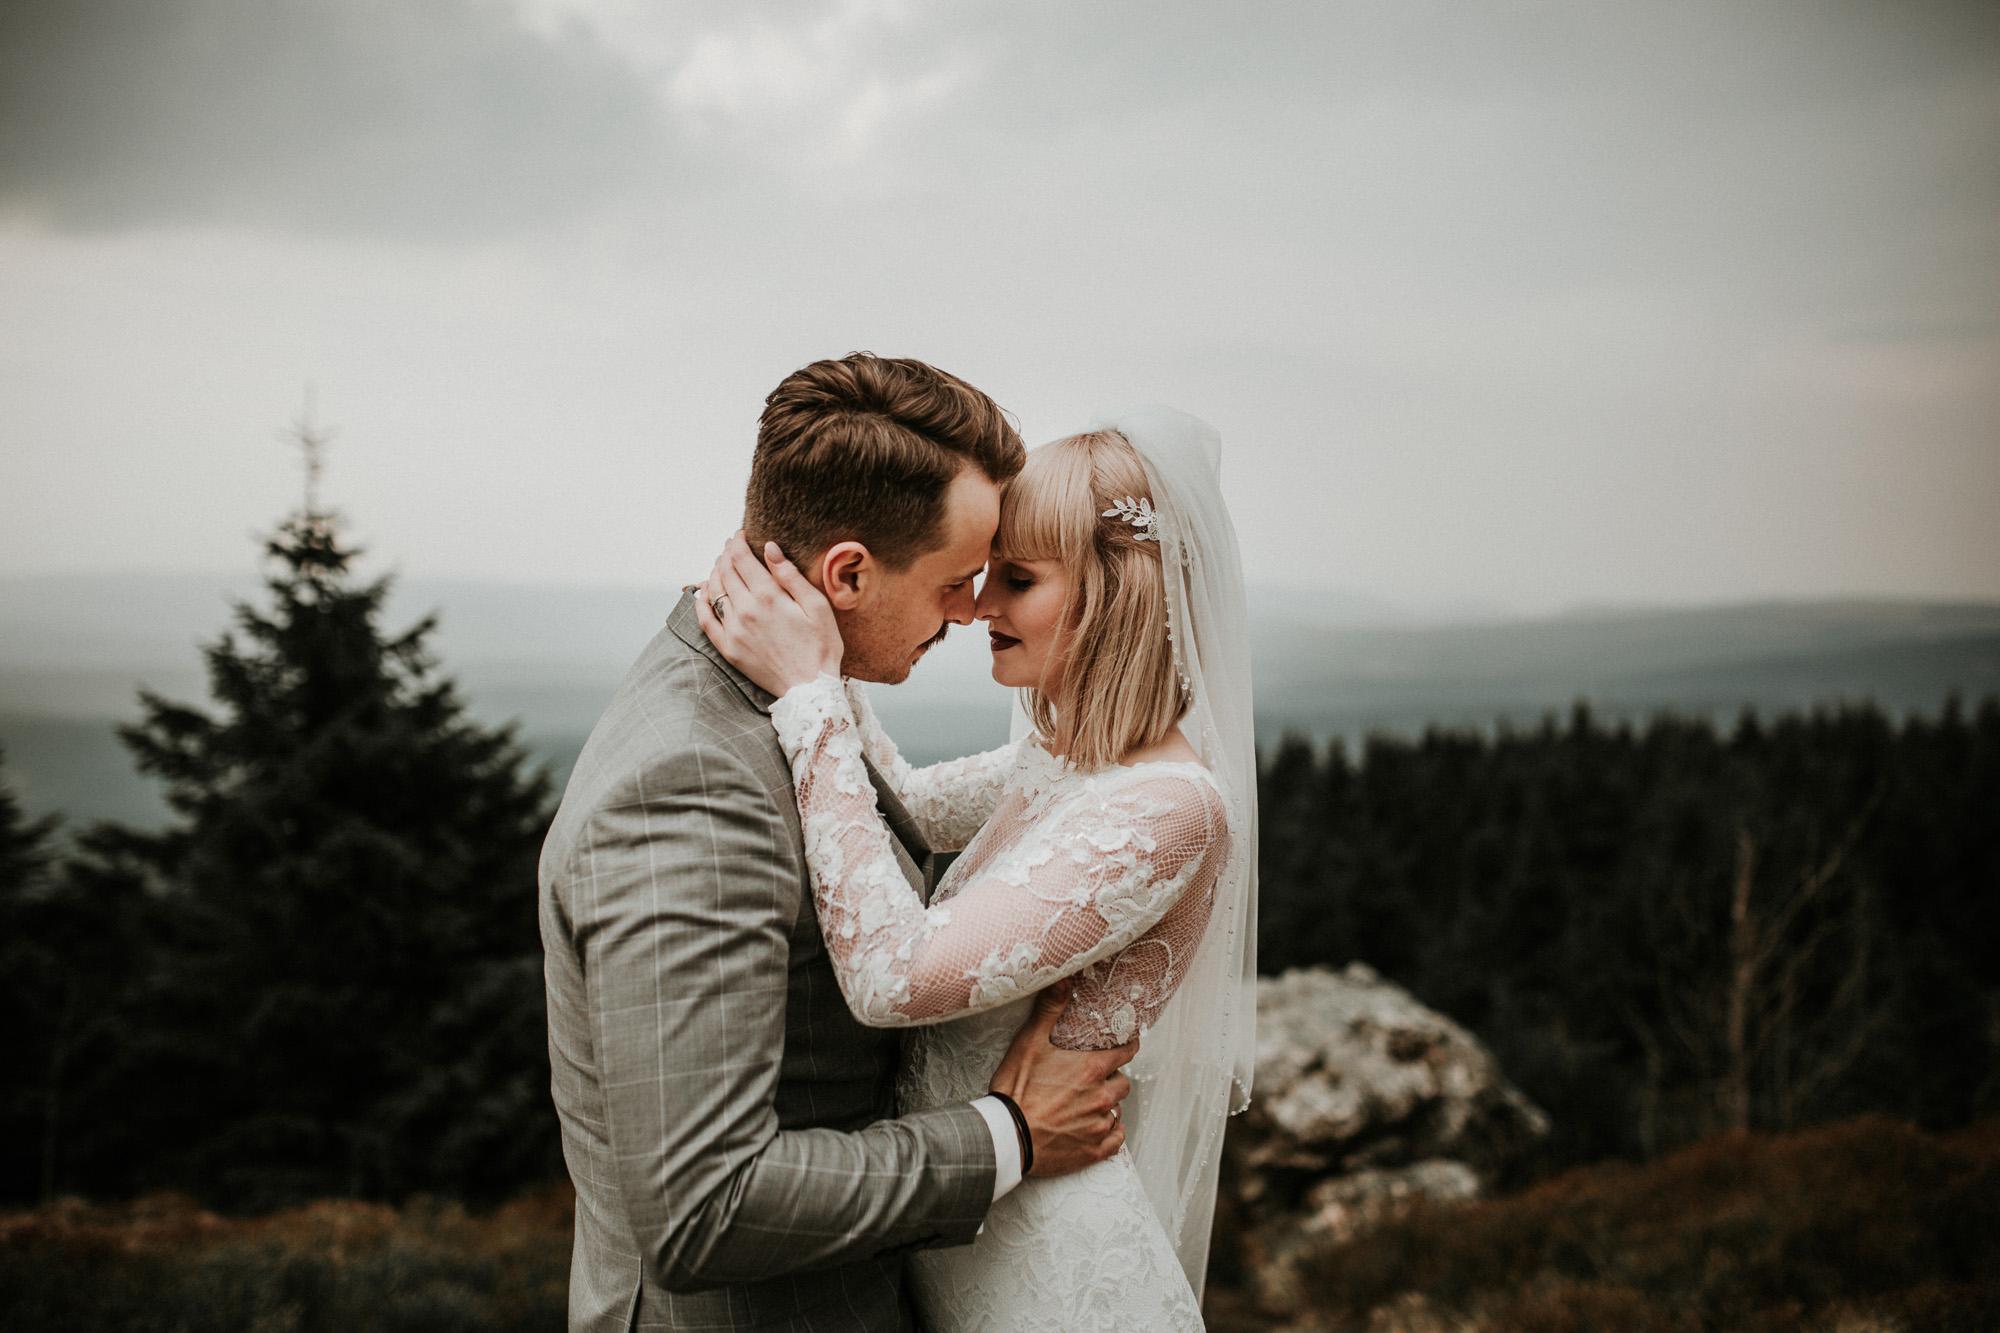 DanielaMarquardtPhotography_Hochzeitsfotograf_Düsseldorf_Köln_Mallorca_Bayern_Austria_Harz_LinaundMaik_Afterwedding-Shooting_Weddingphotographer_Ibiza_Tuskany_Italien_Toskana79